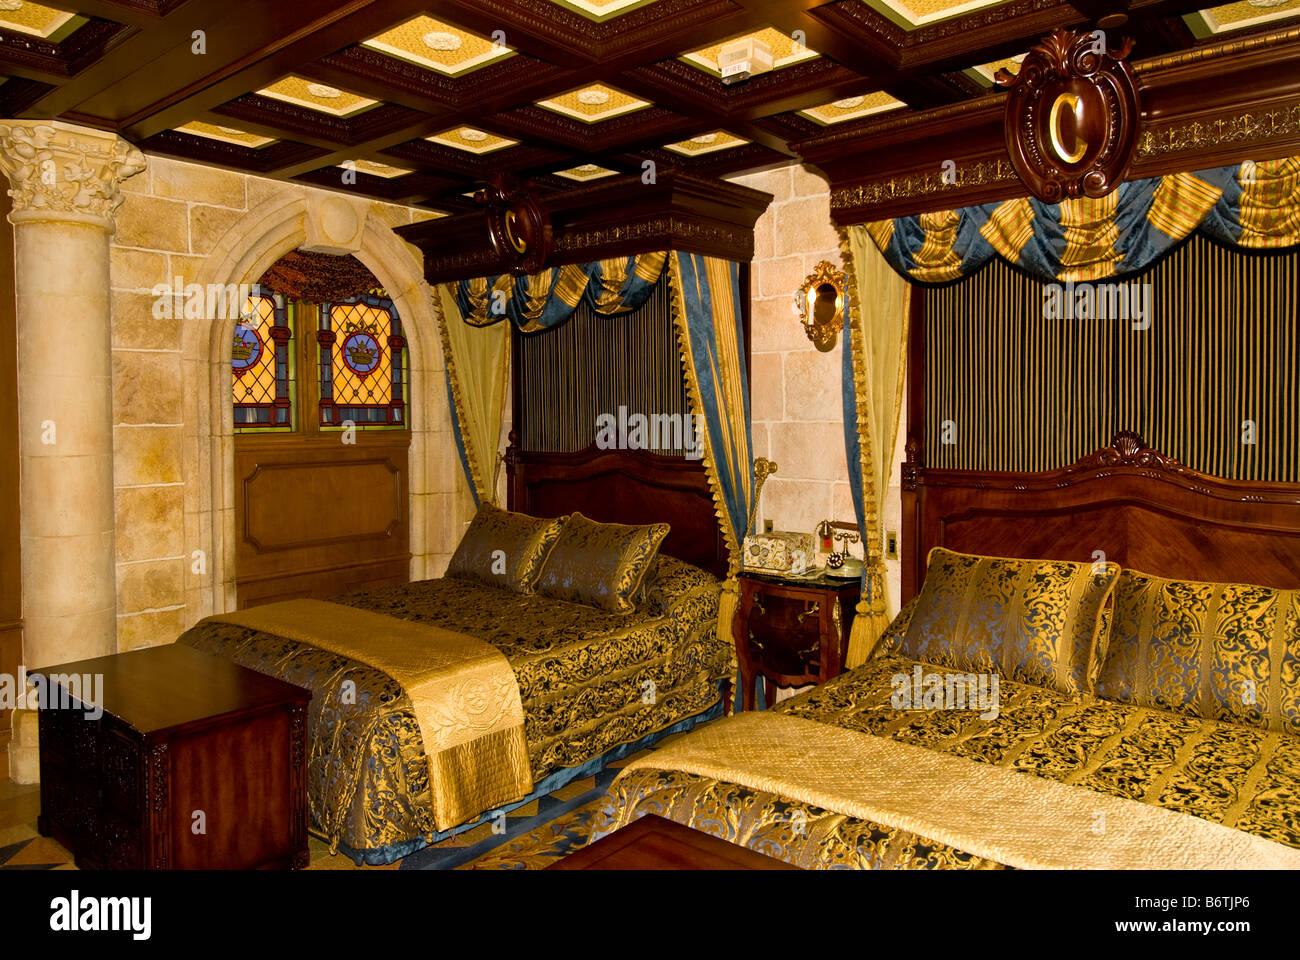 Cinderella Castle Suite Bedroom Magic Kingdom Walt Disney World Stock Photo 21439886 Alamy